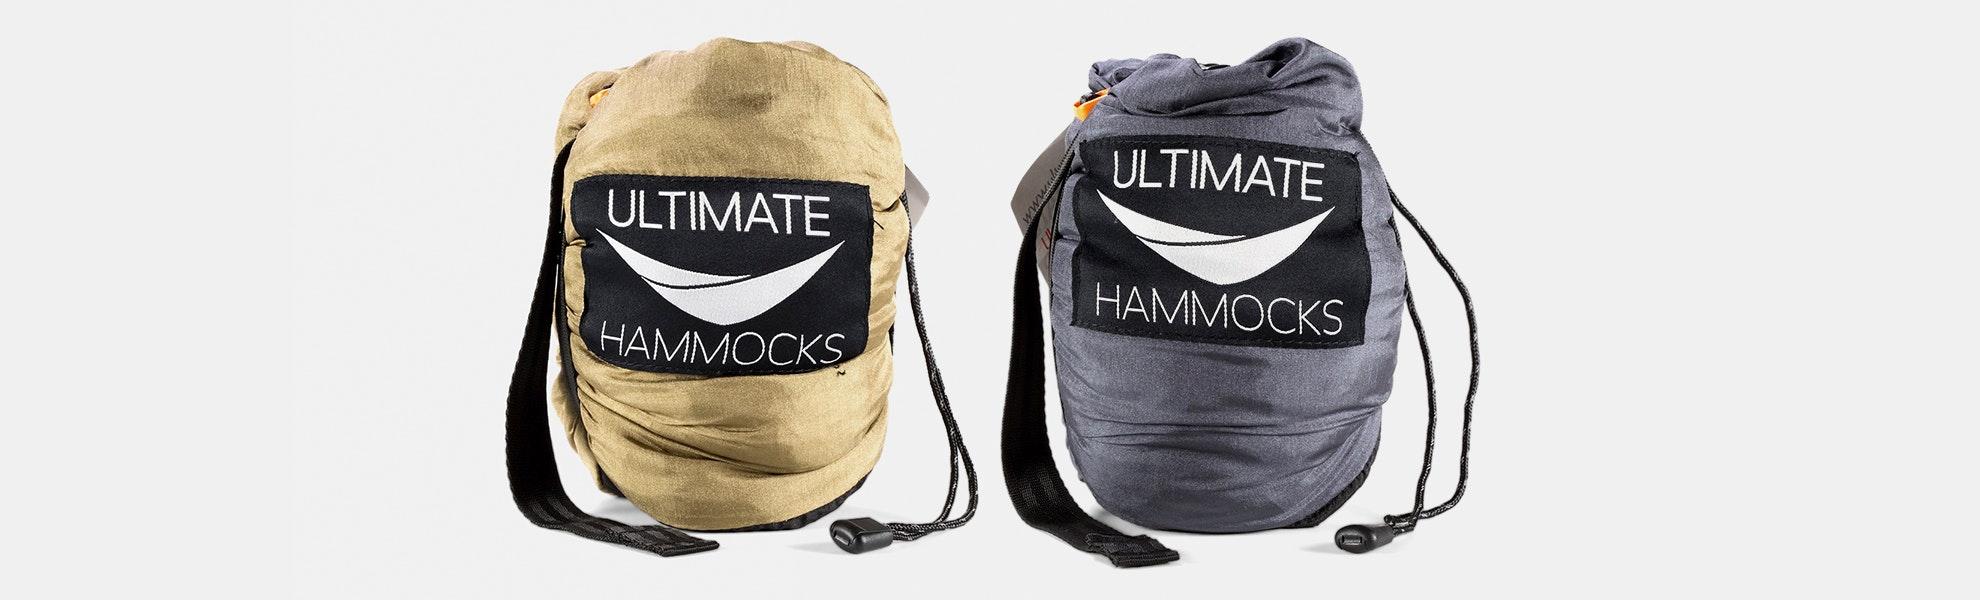 Ultimate Hammock Double